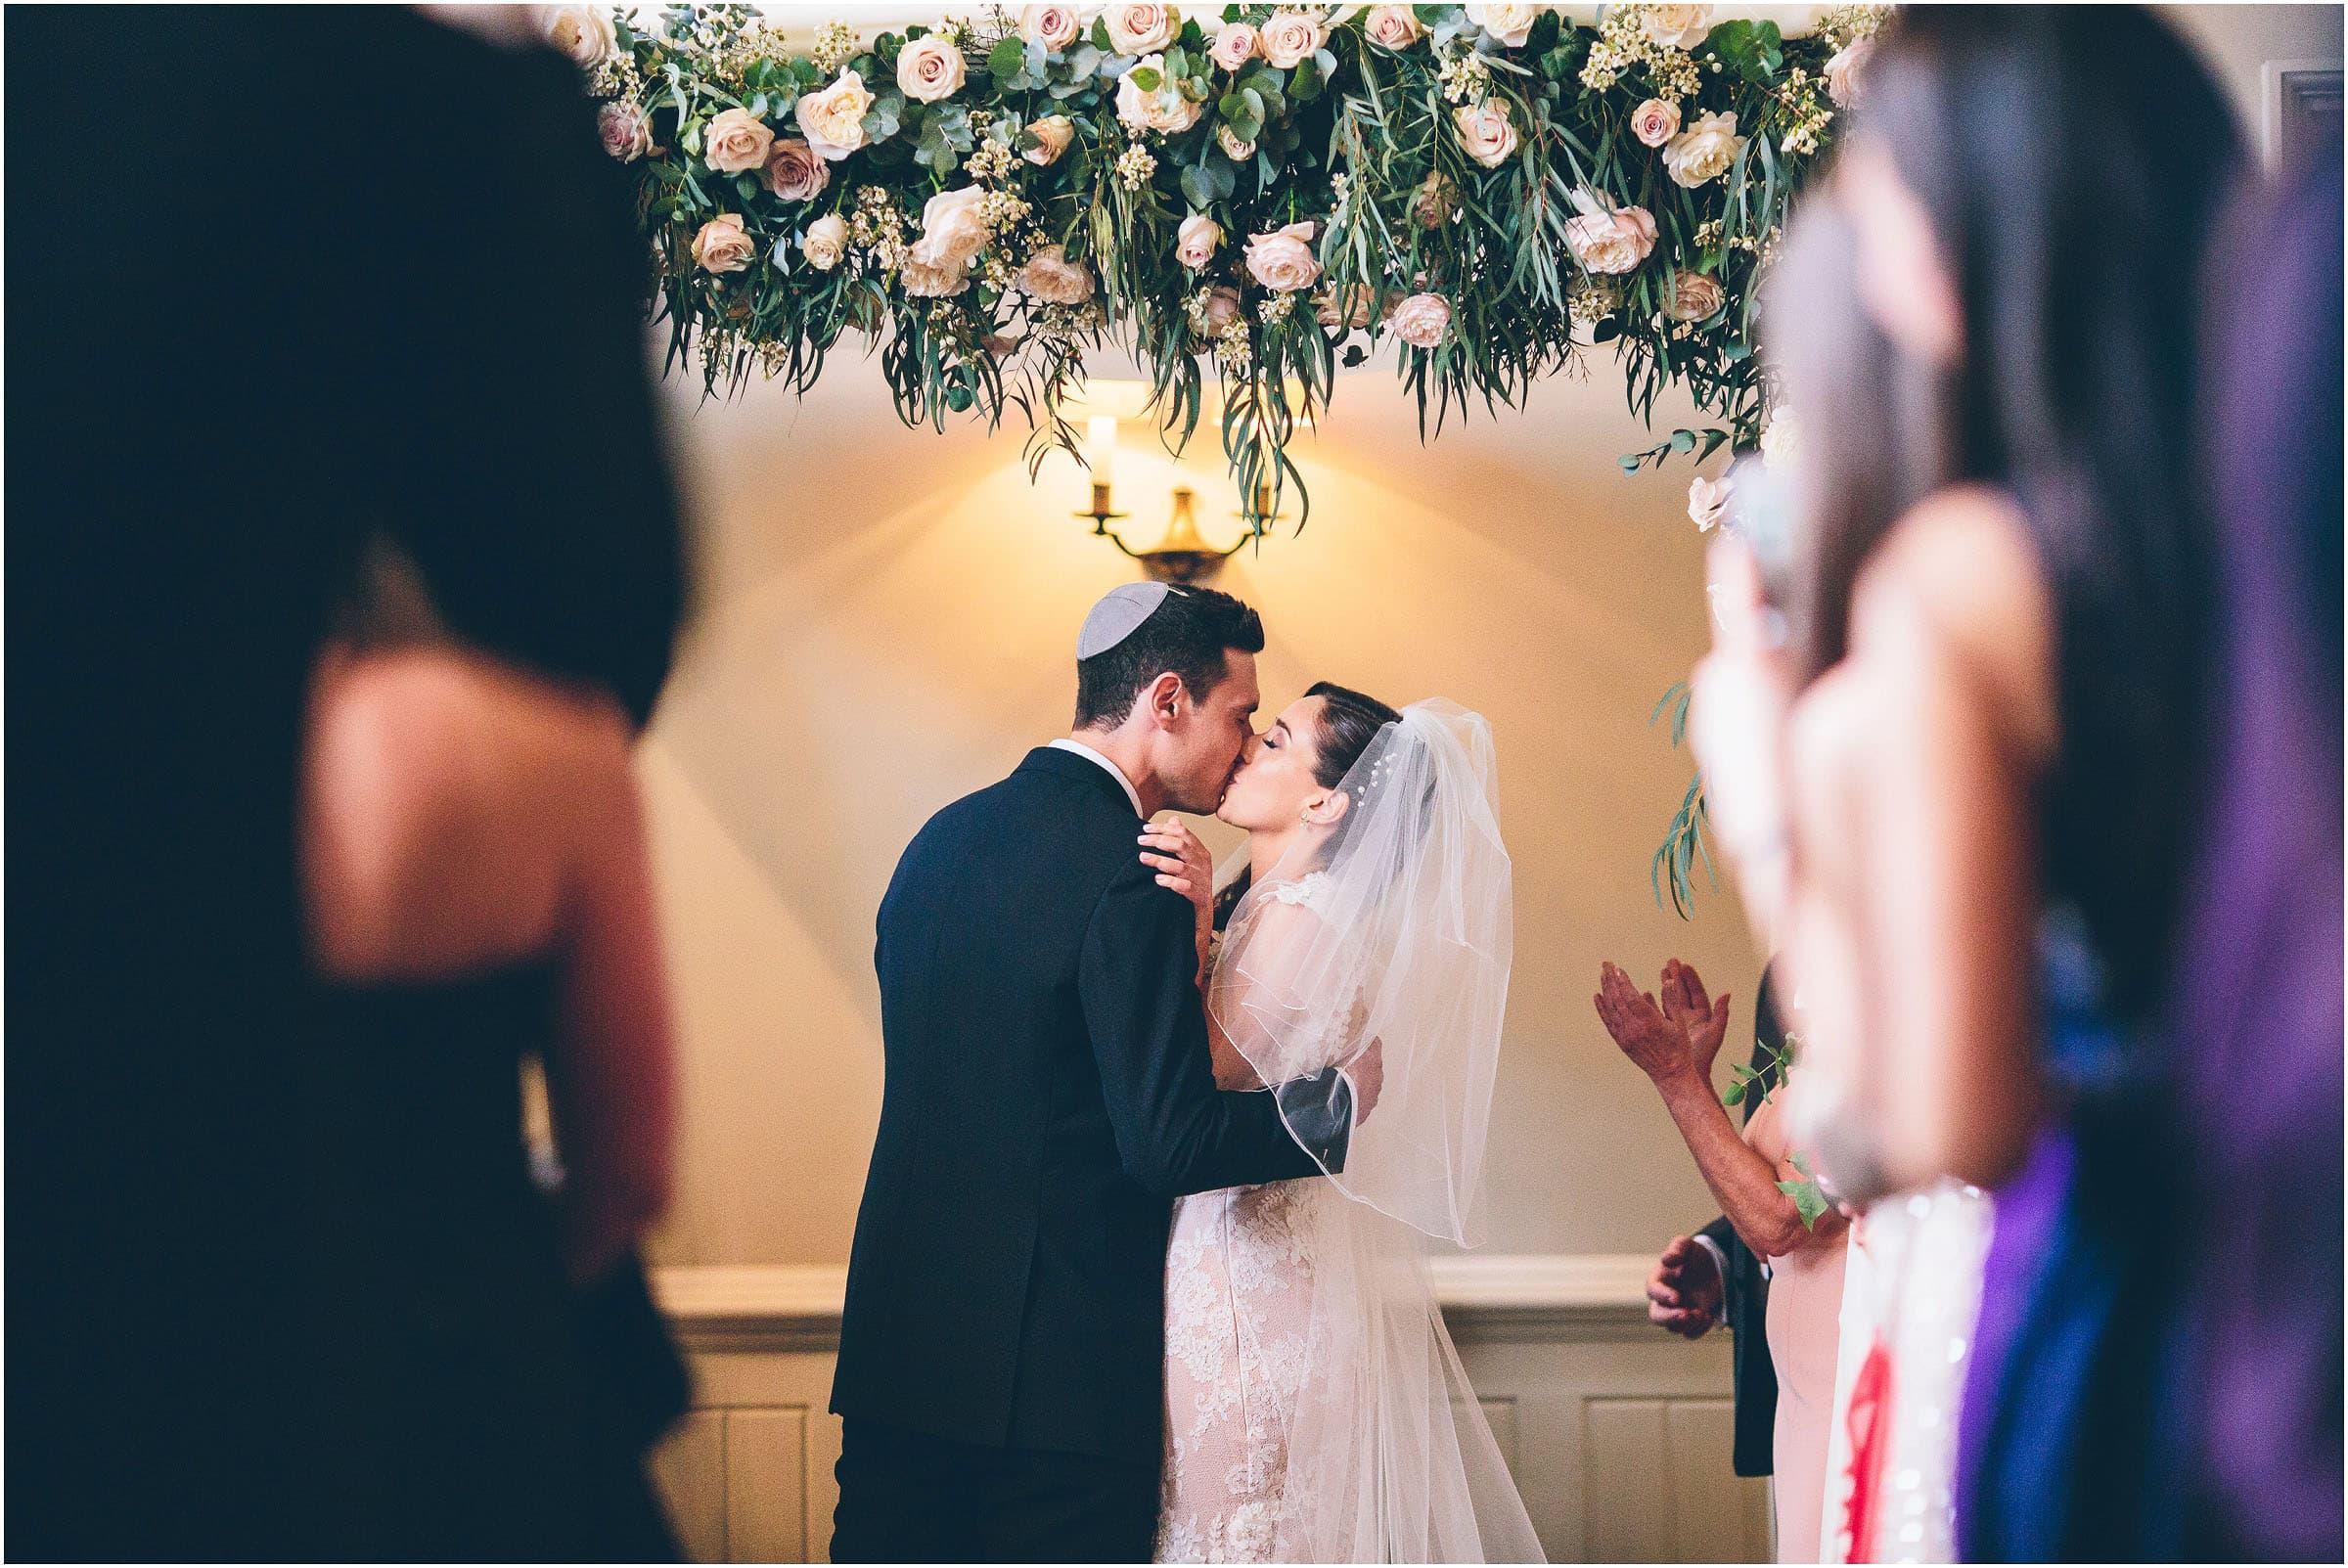 Elmore_Court_Wedding_Photography_0054